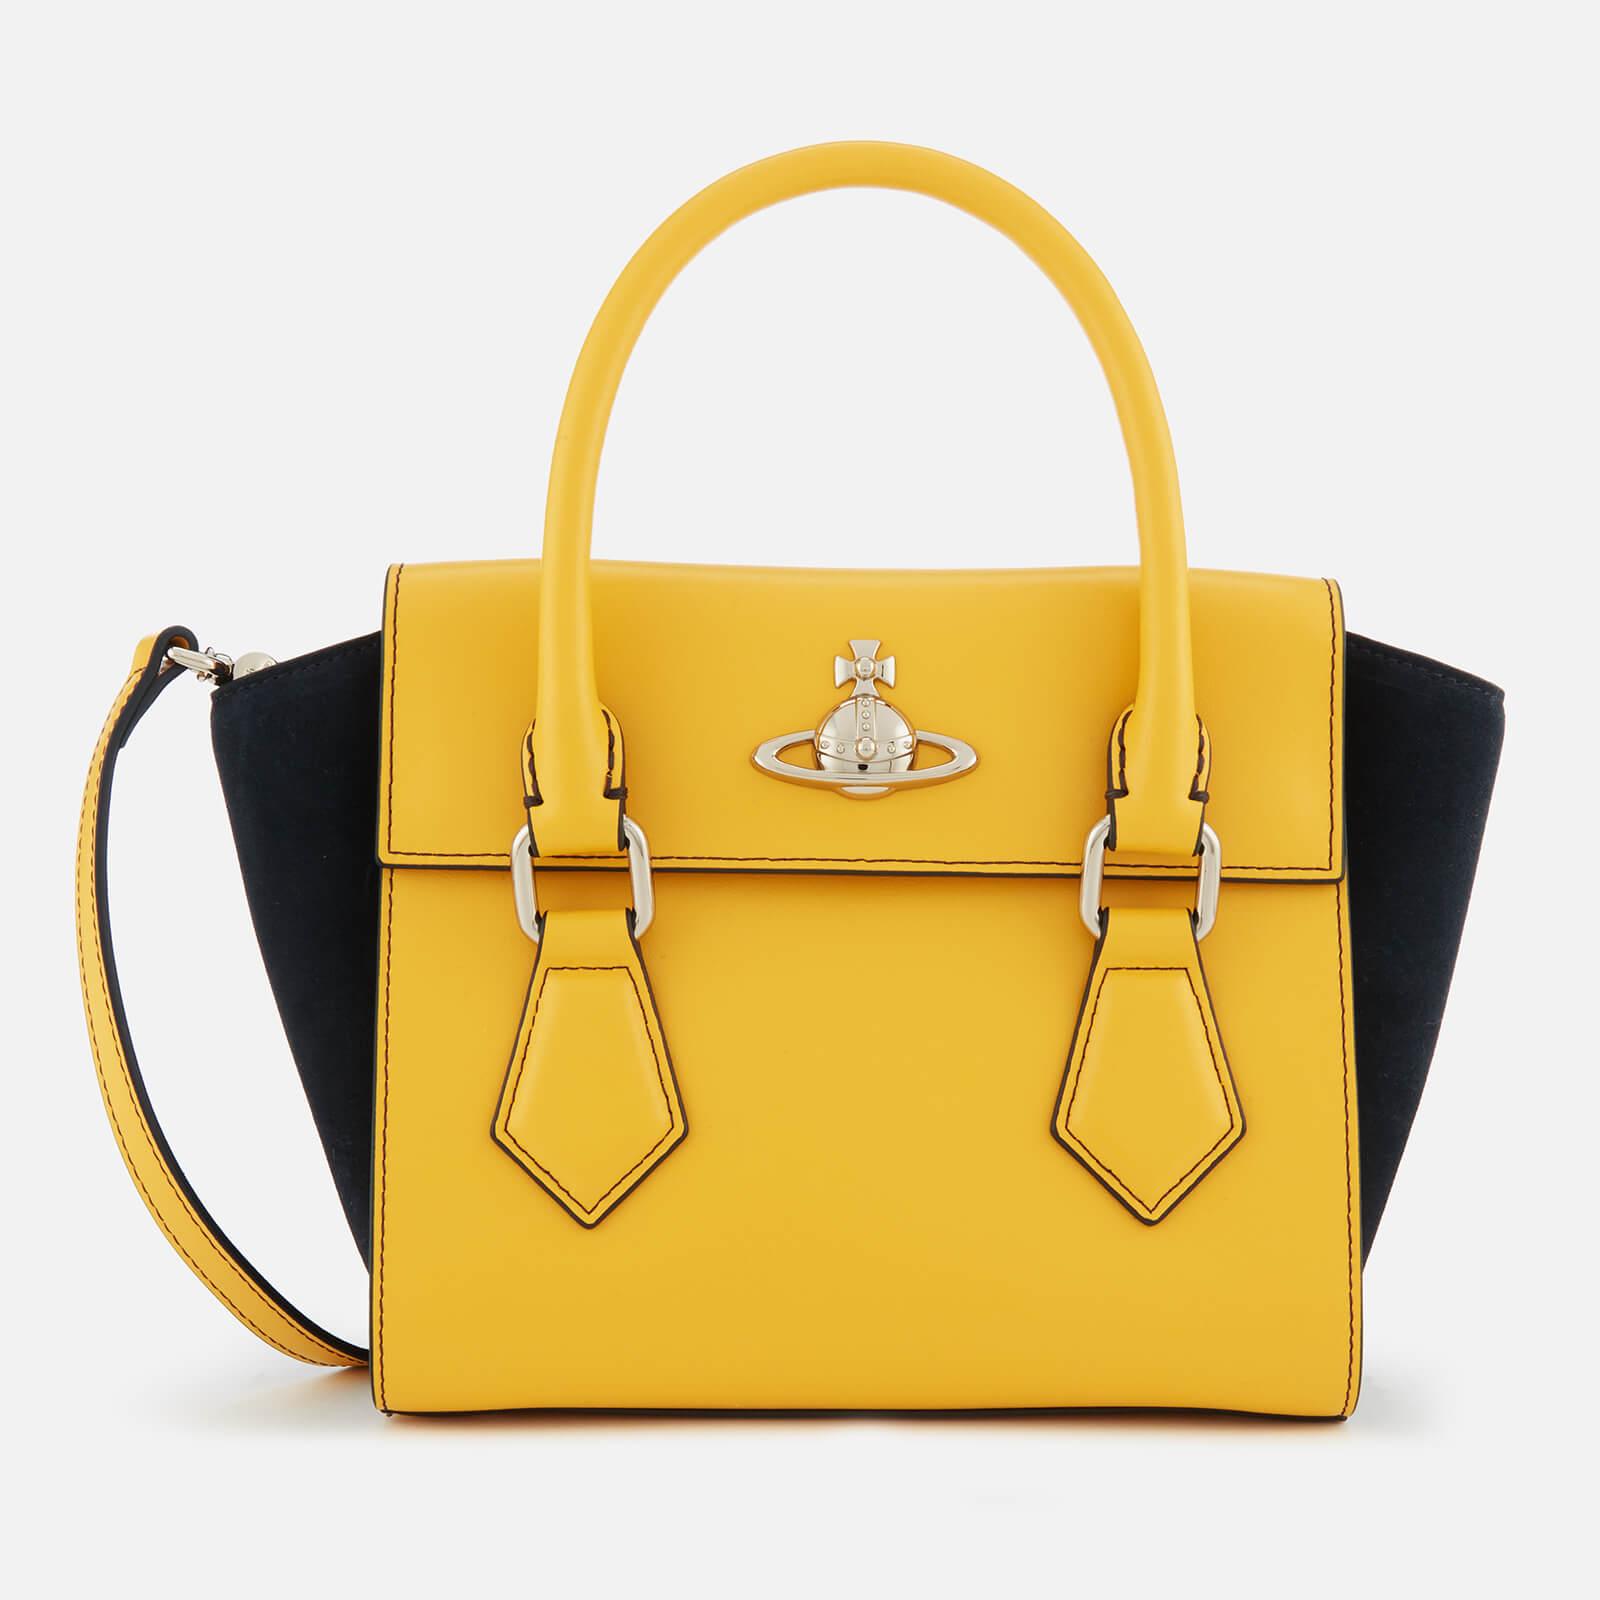 b0dea07a5f8e Vivienne Westwood Women's Matilda Small Handbag - Yellow - Free UK Delivery  over £50